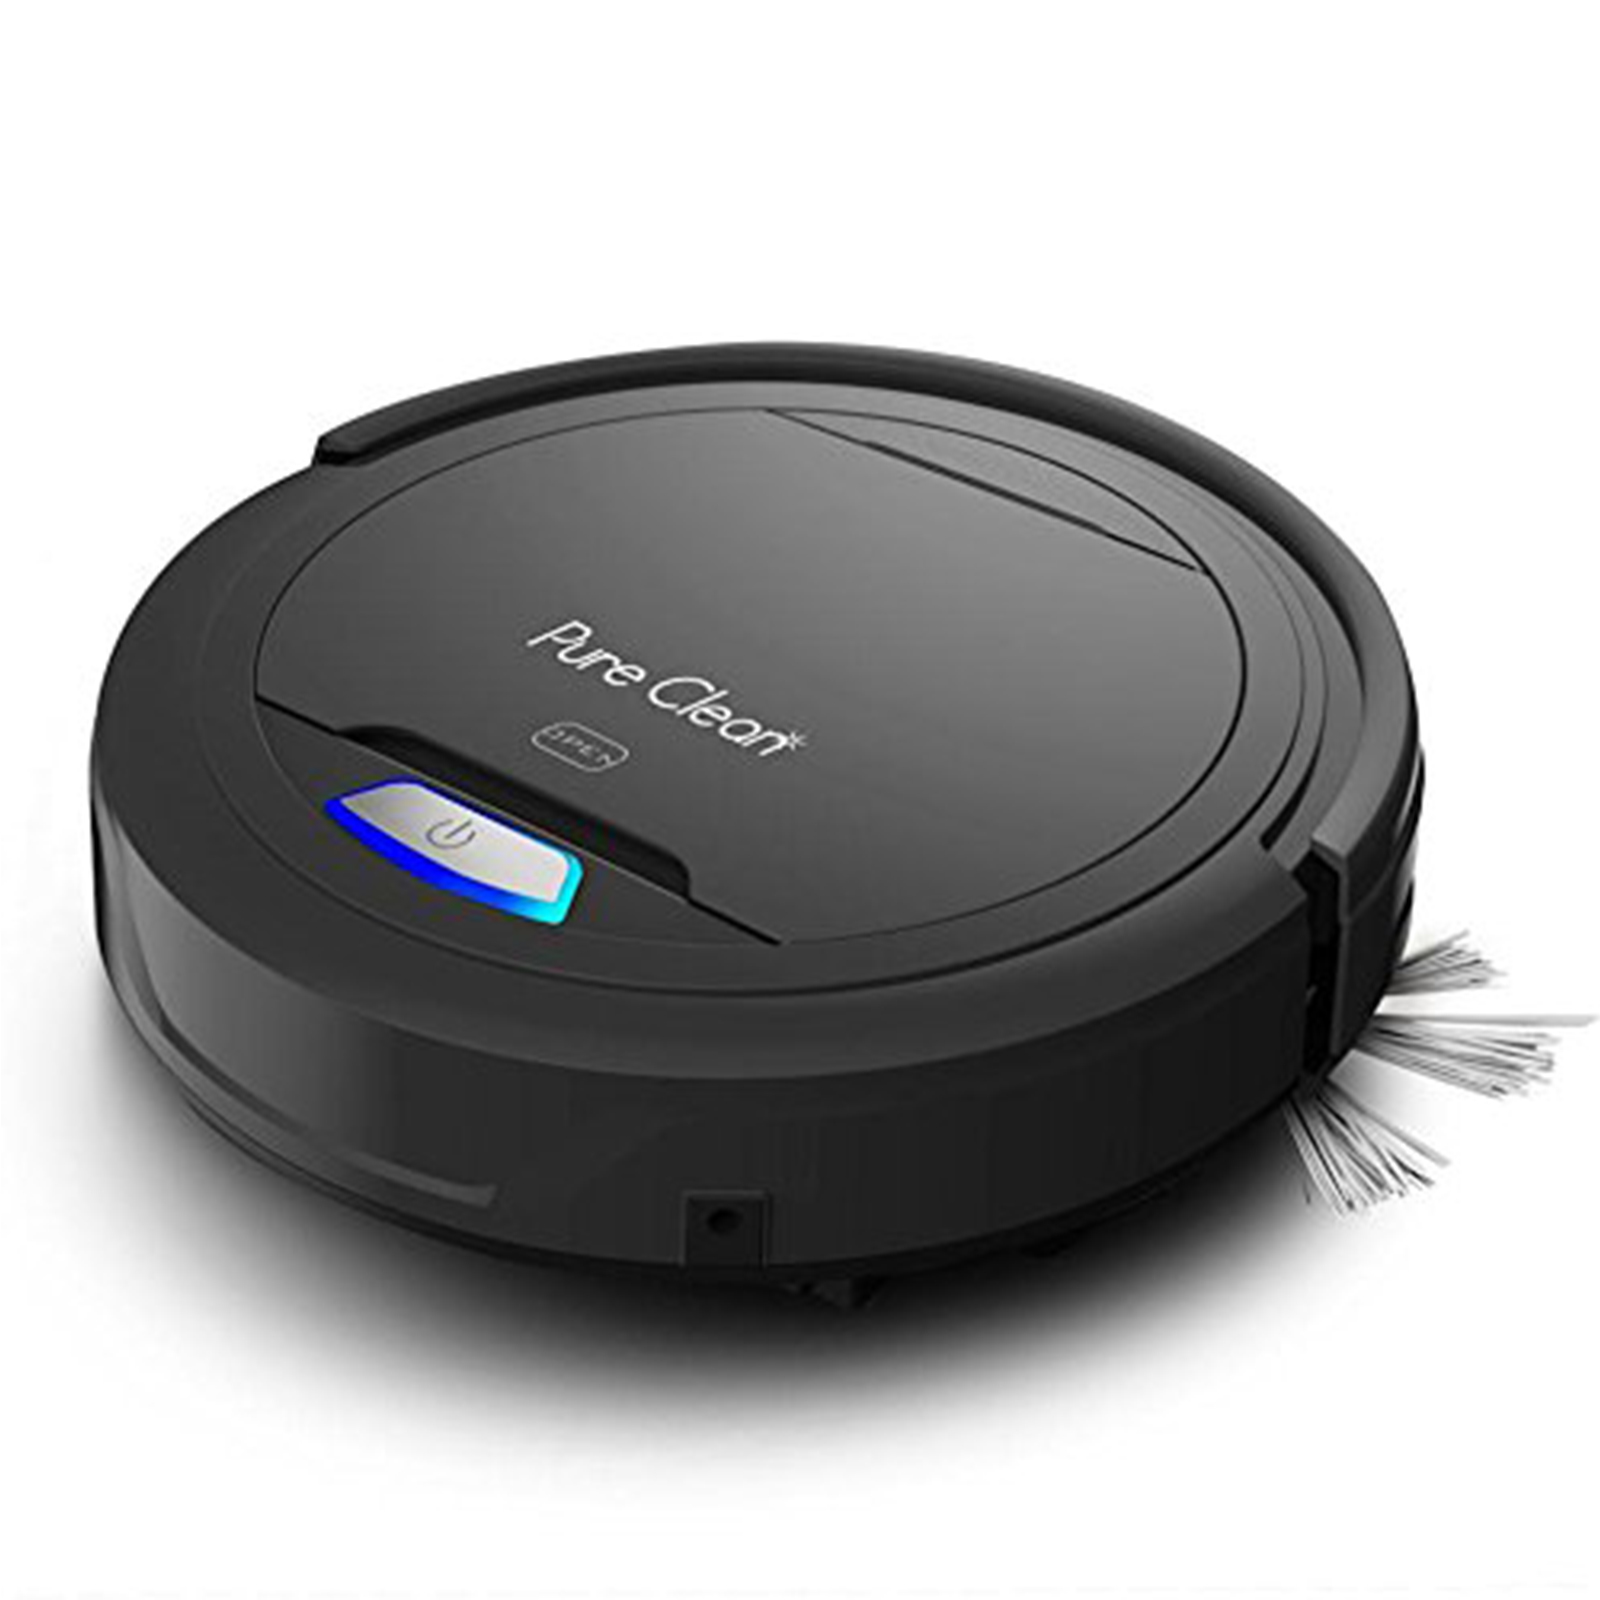 Pyle PureClean Automatic Robot Vacuum Cleaner; HEPA Filter Pet Hair Allergies Friendly